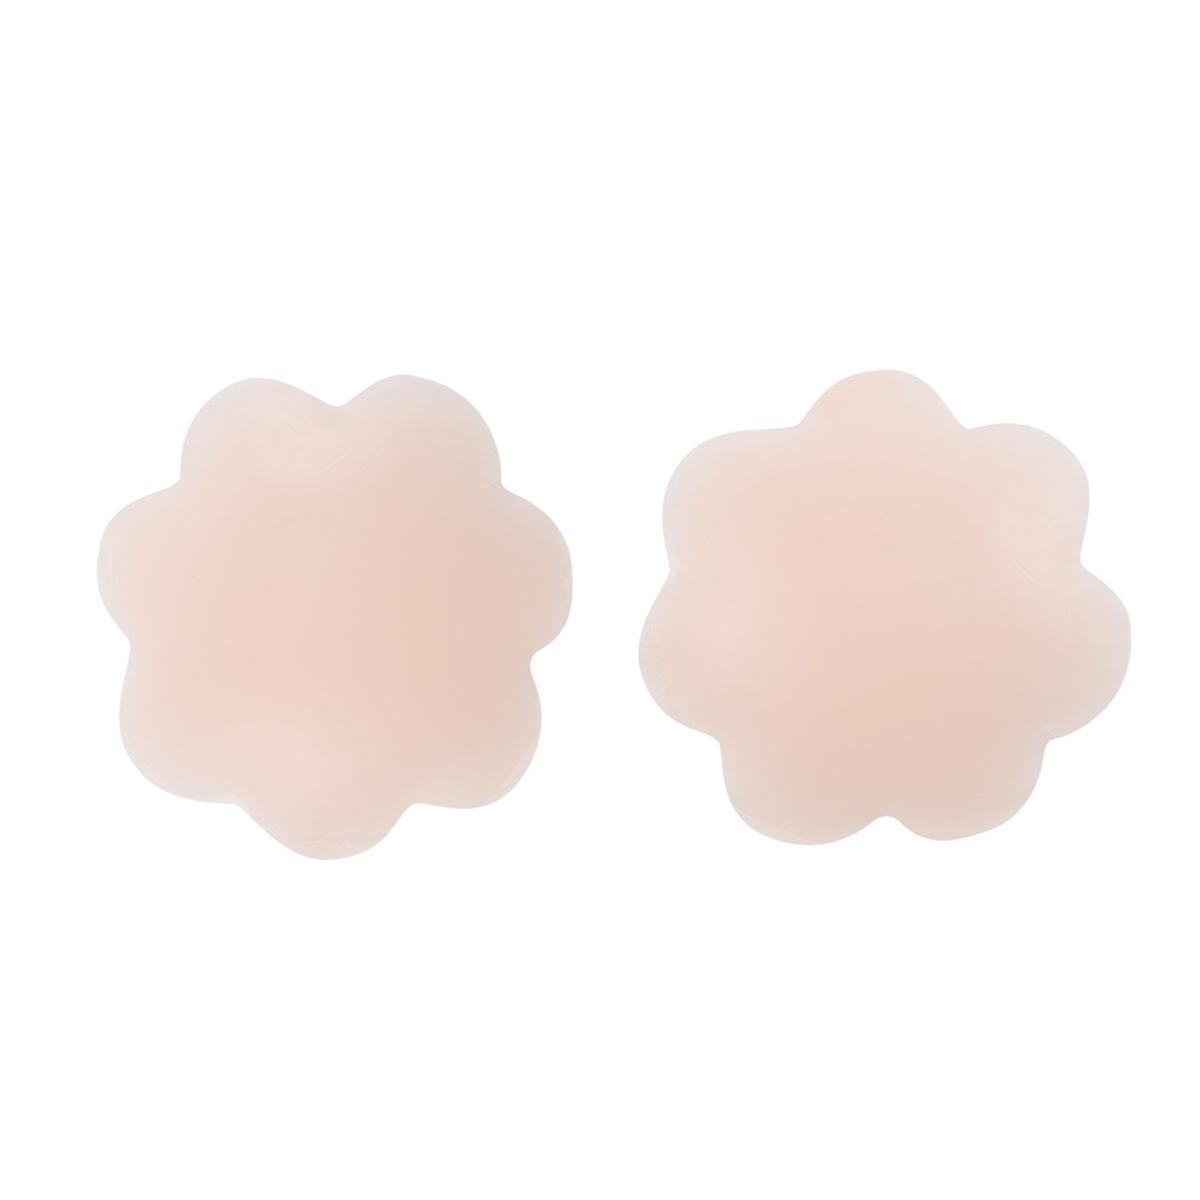 Boolavard® Thin Pasties Reusable Adhesive Silicone Nipple Covers (4 Pcs)…